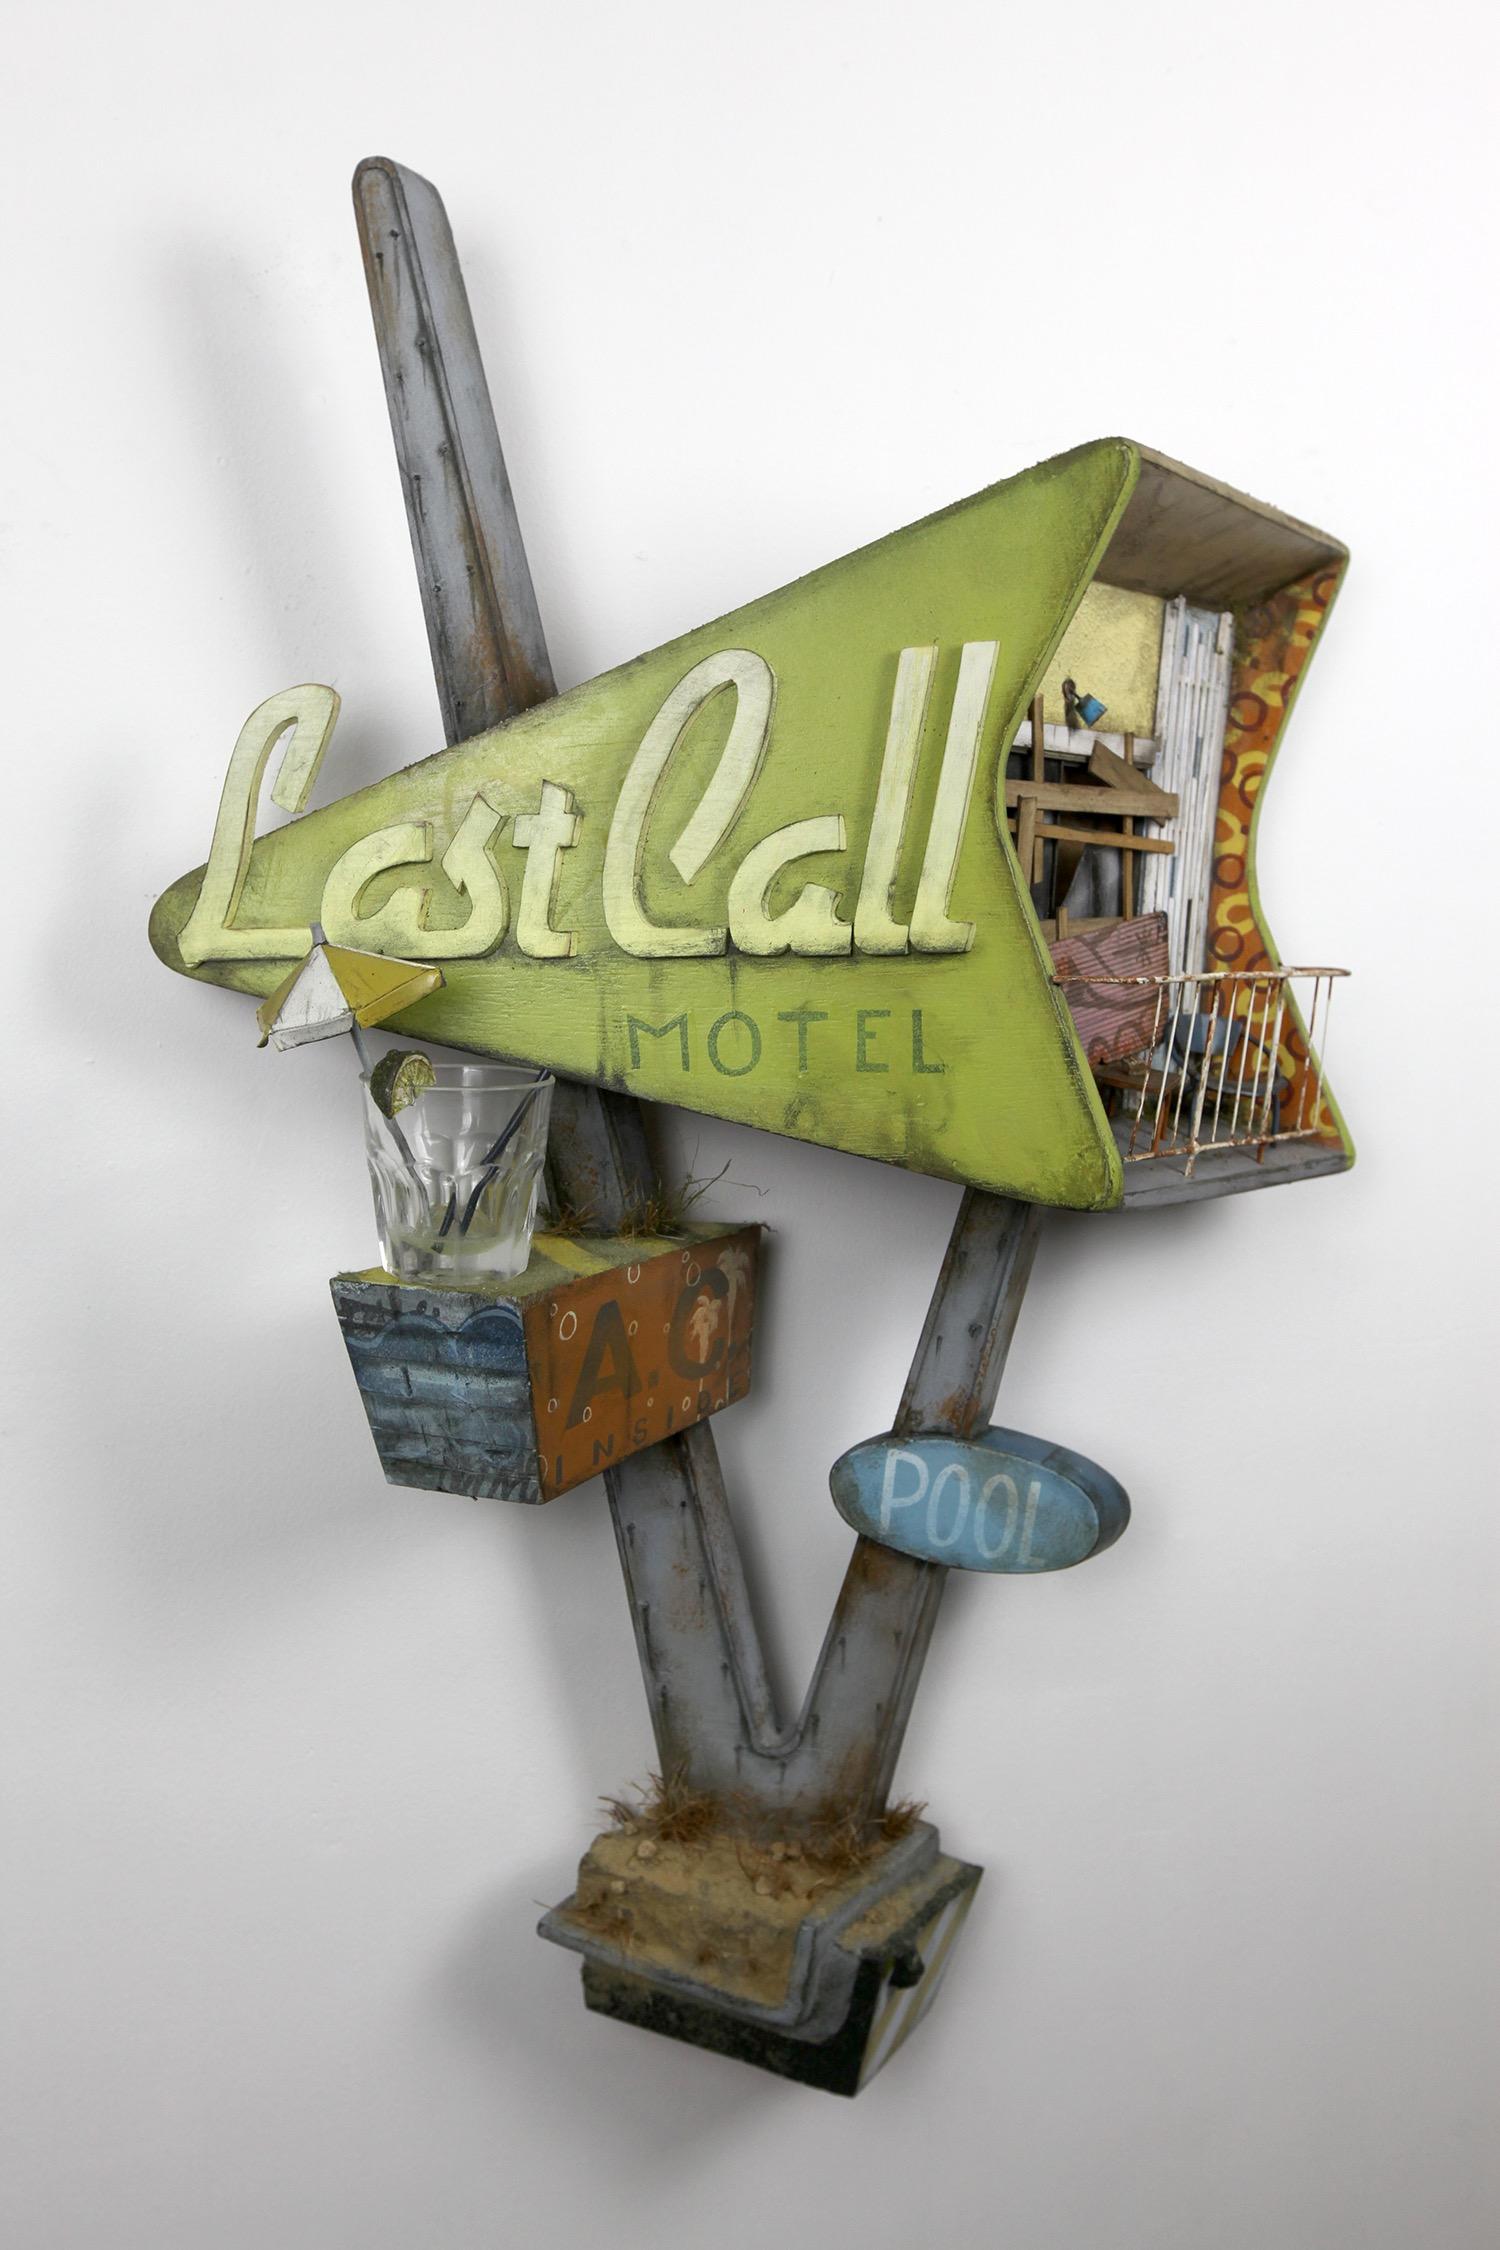 christopher-konecki-sculpture-Last-Call-1-copy